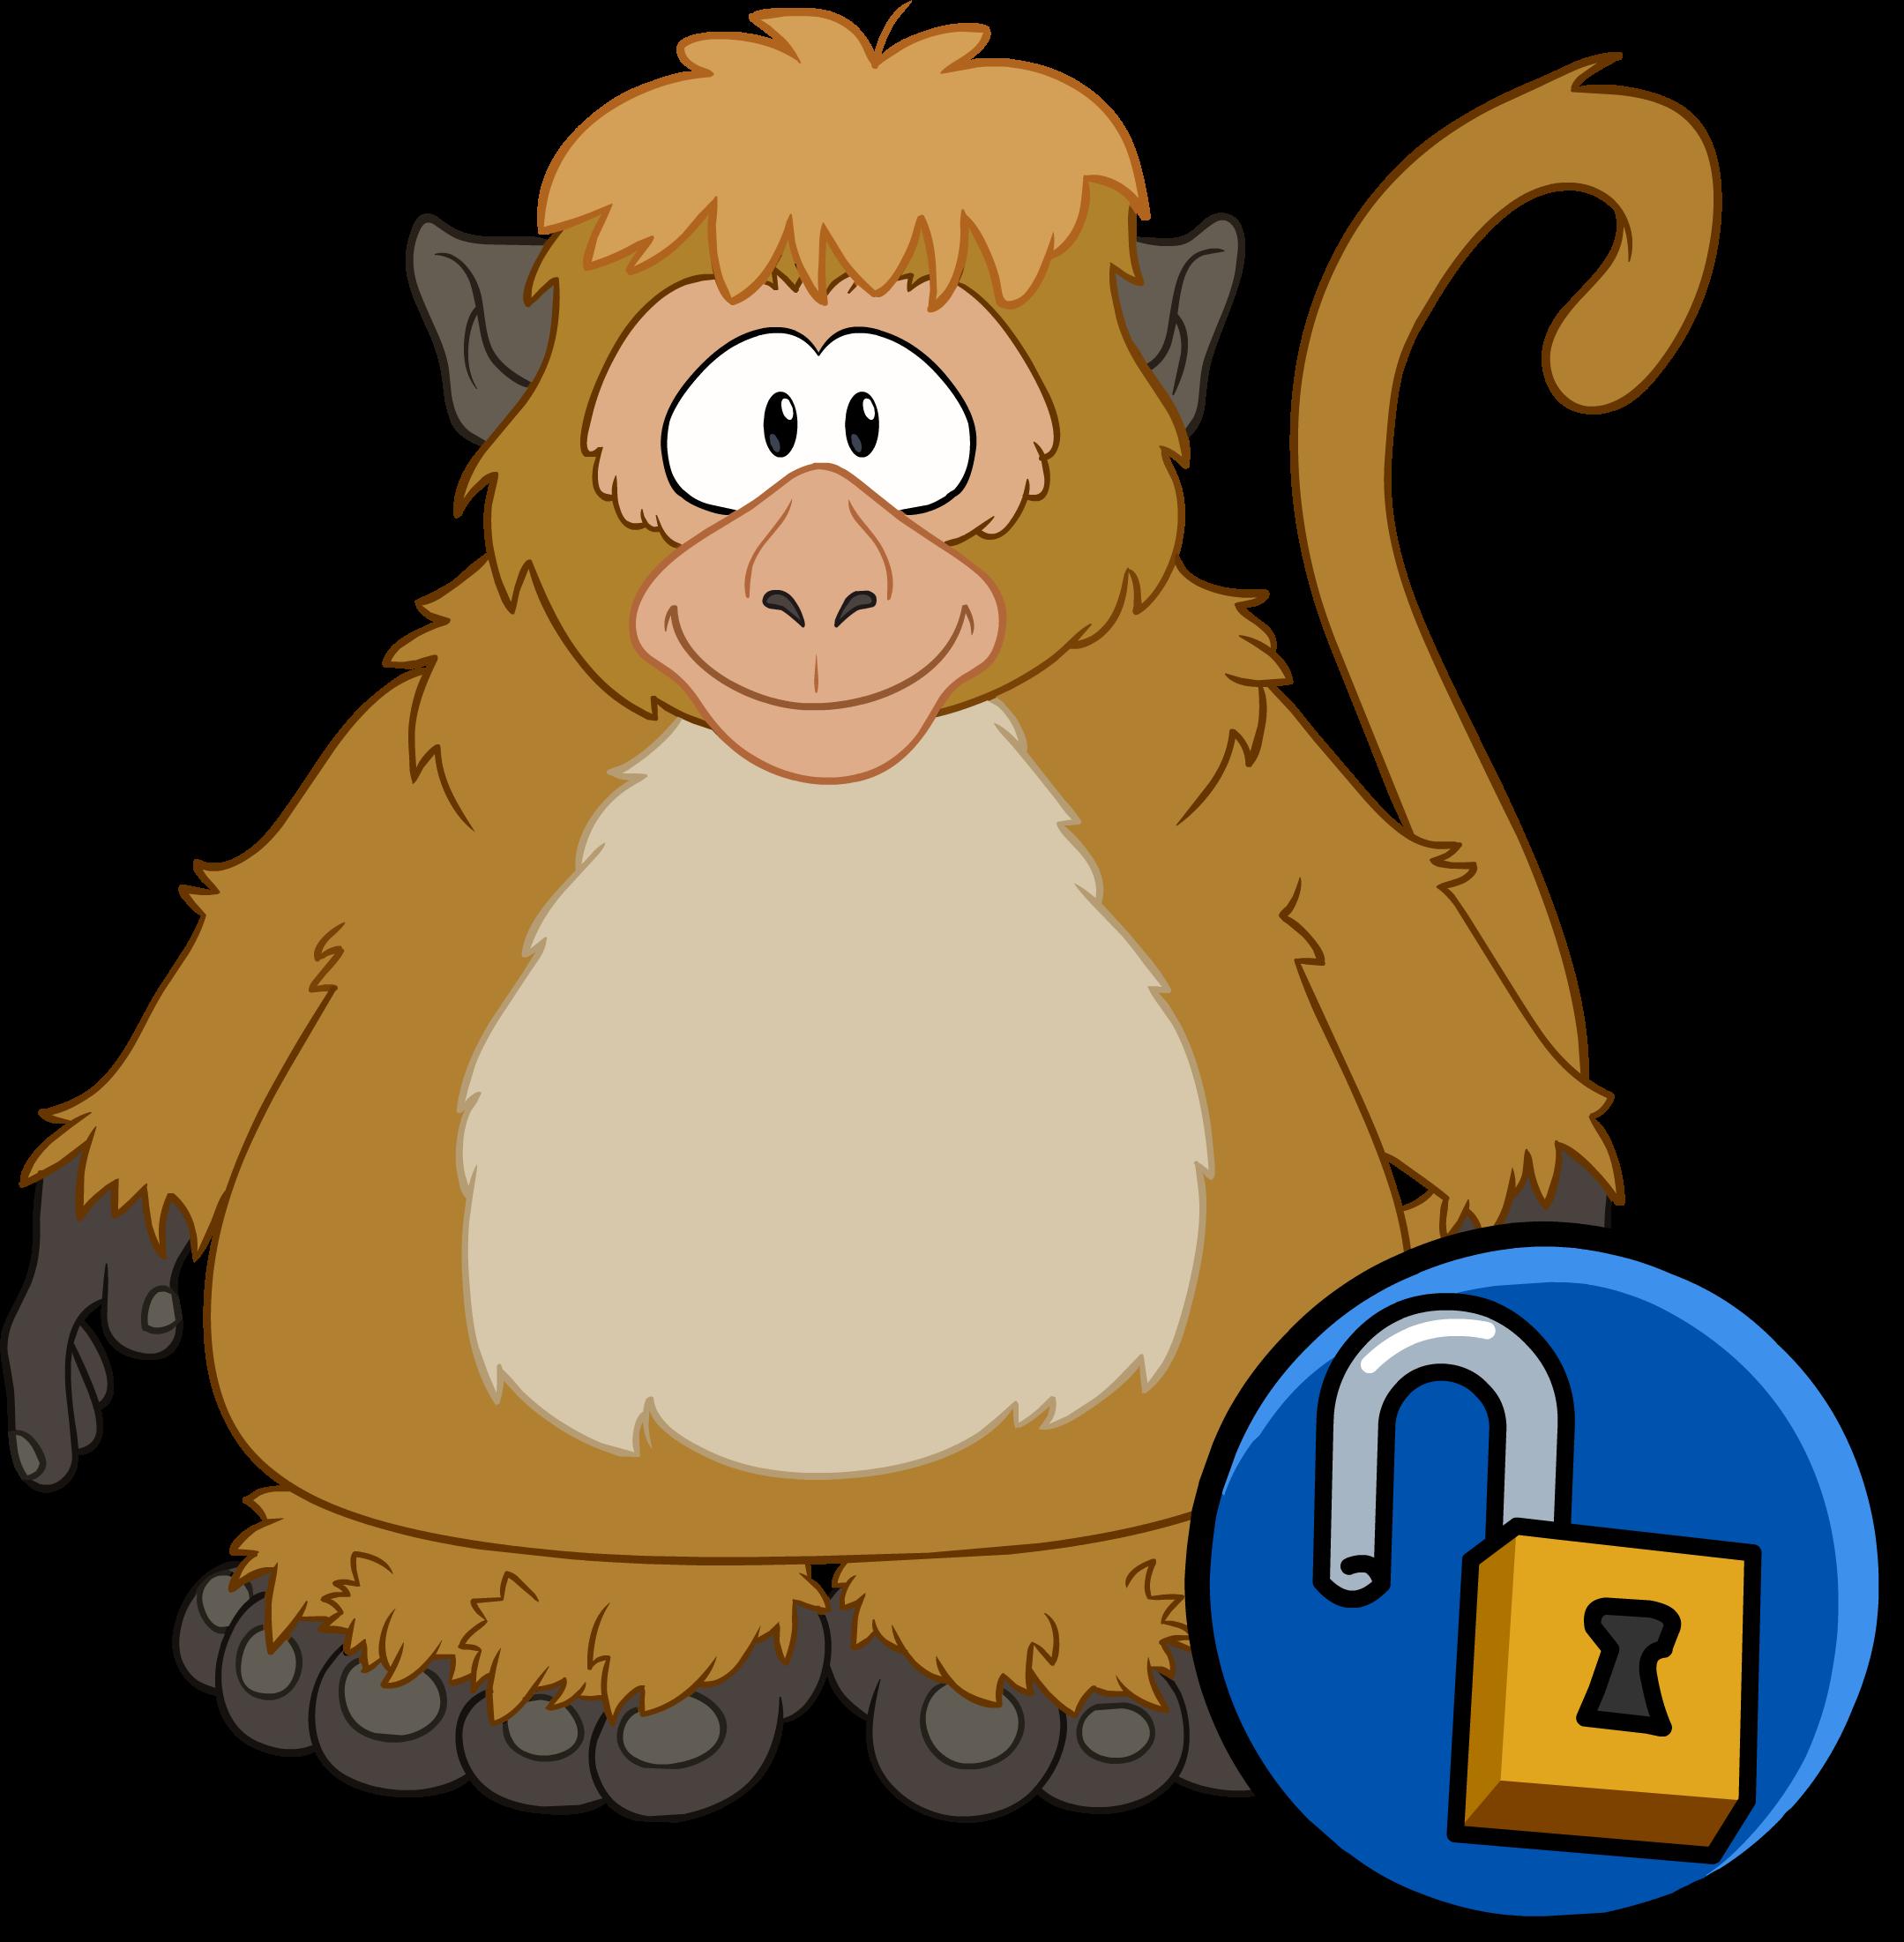 Costume clipart animal costume. Monkey club penguin wiki